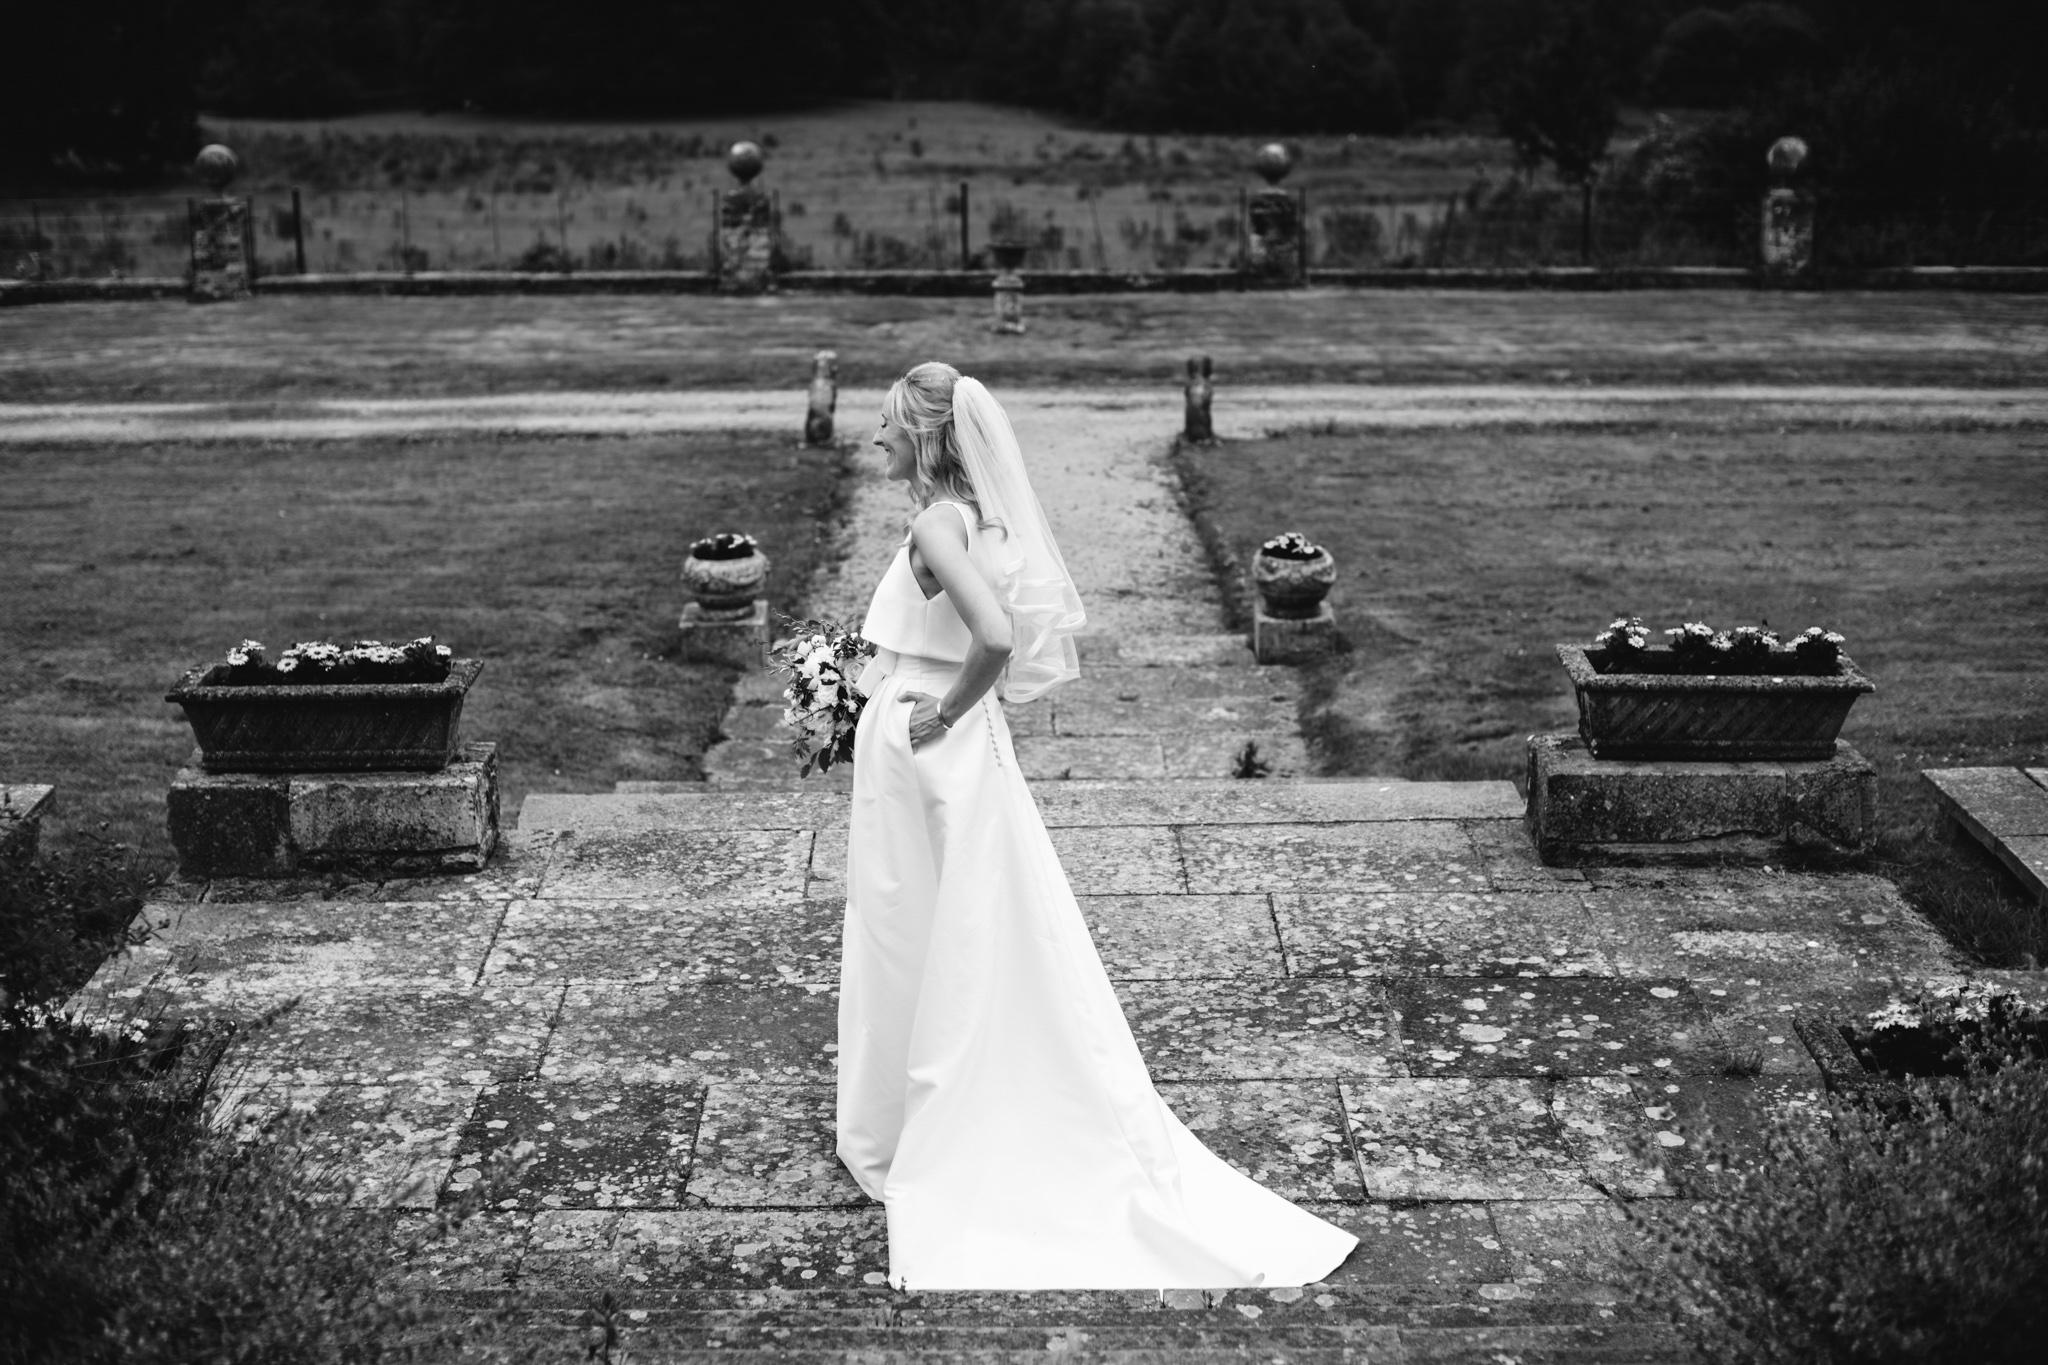 derbyshire-wedding-photographer-videographer-camera-hannah-28.jpg